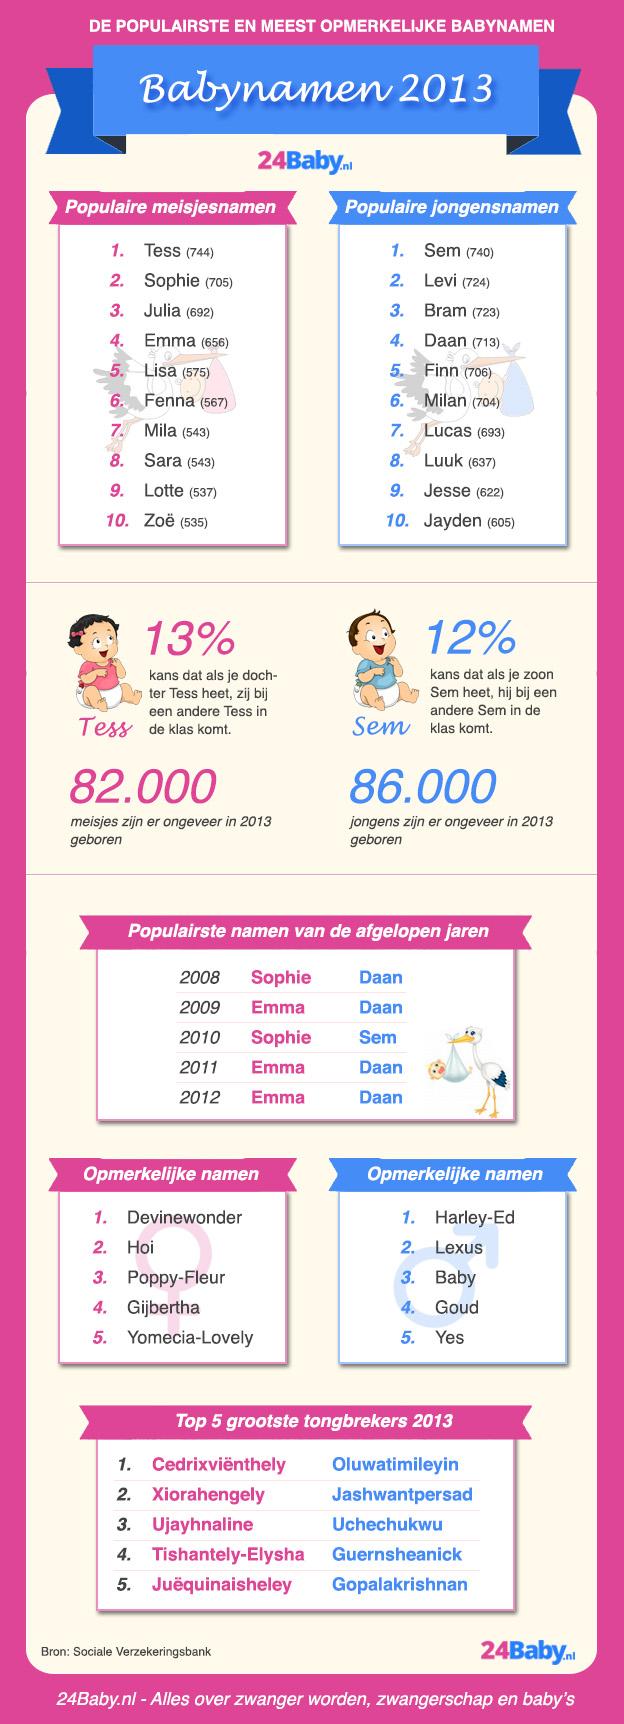 Babynamen 2013 infographic - 24Baby.nl